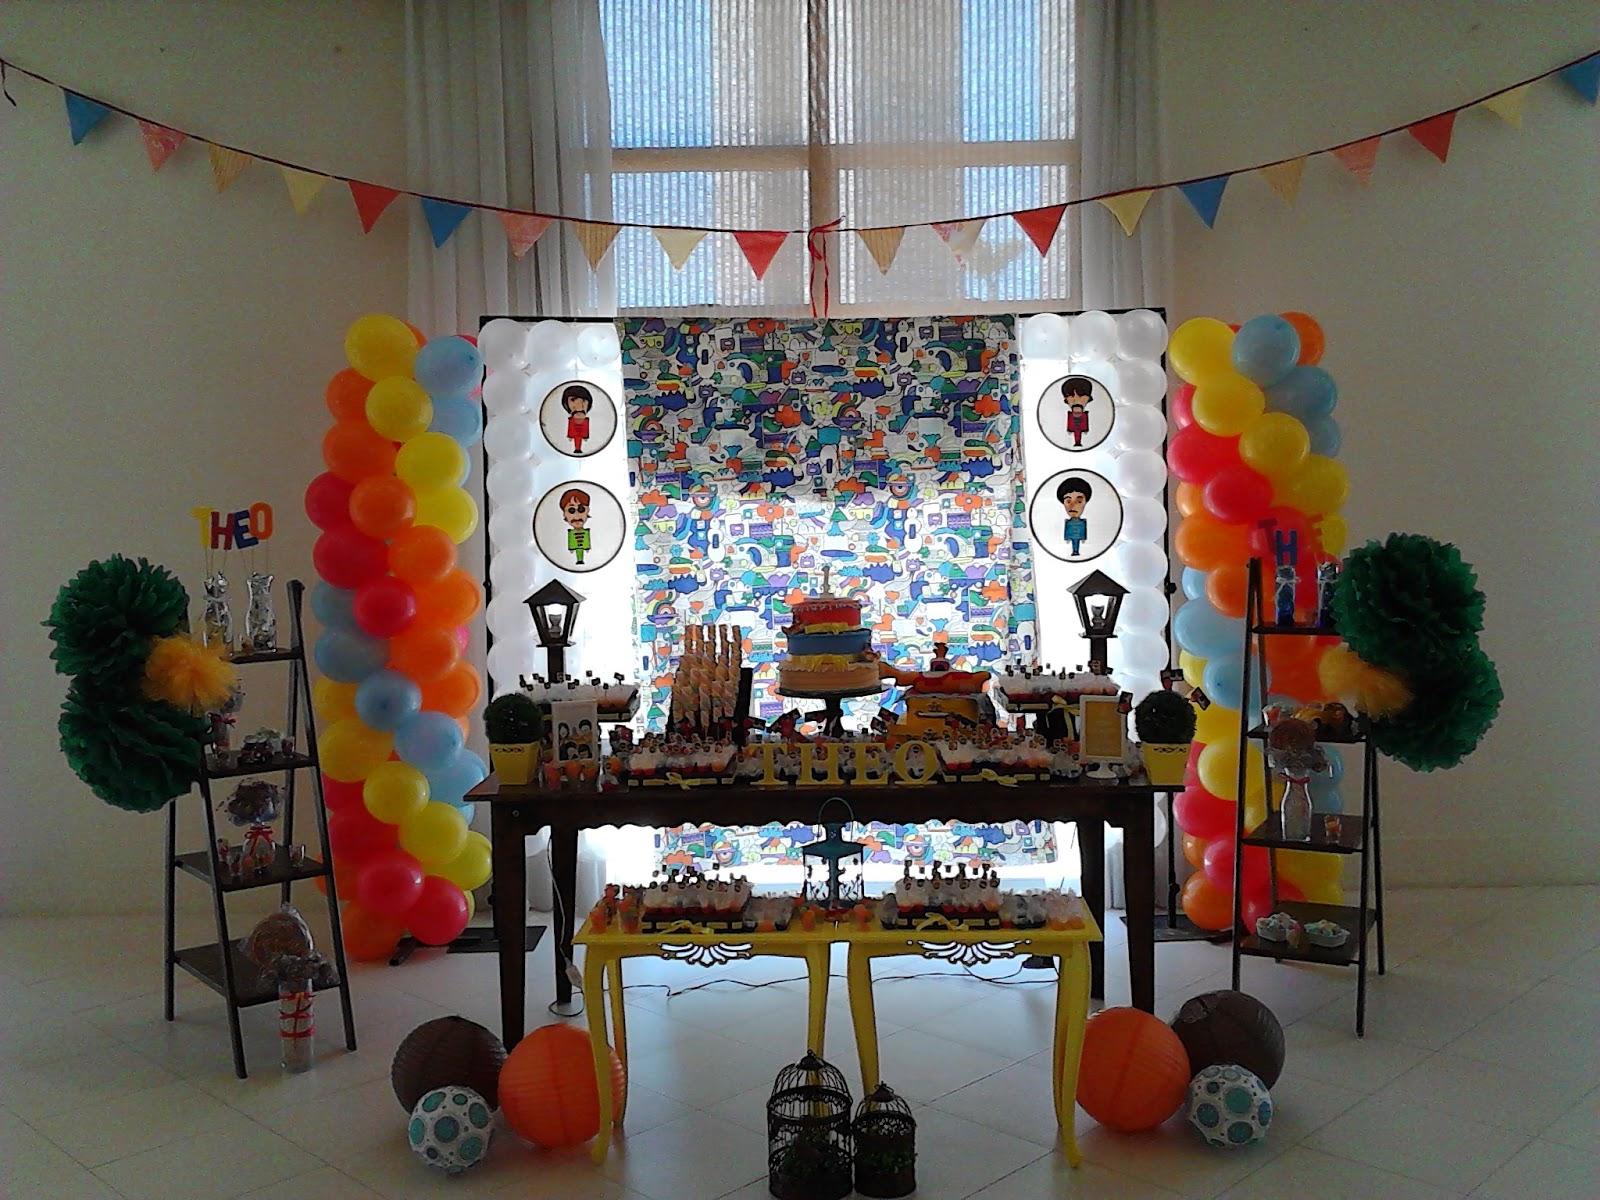 decoracao festa infantil yellow submarine:YELLOW SUBMARINE – Beatles